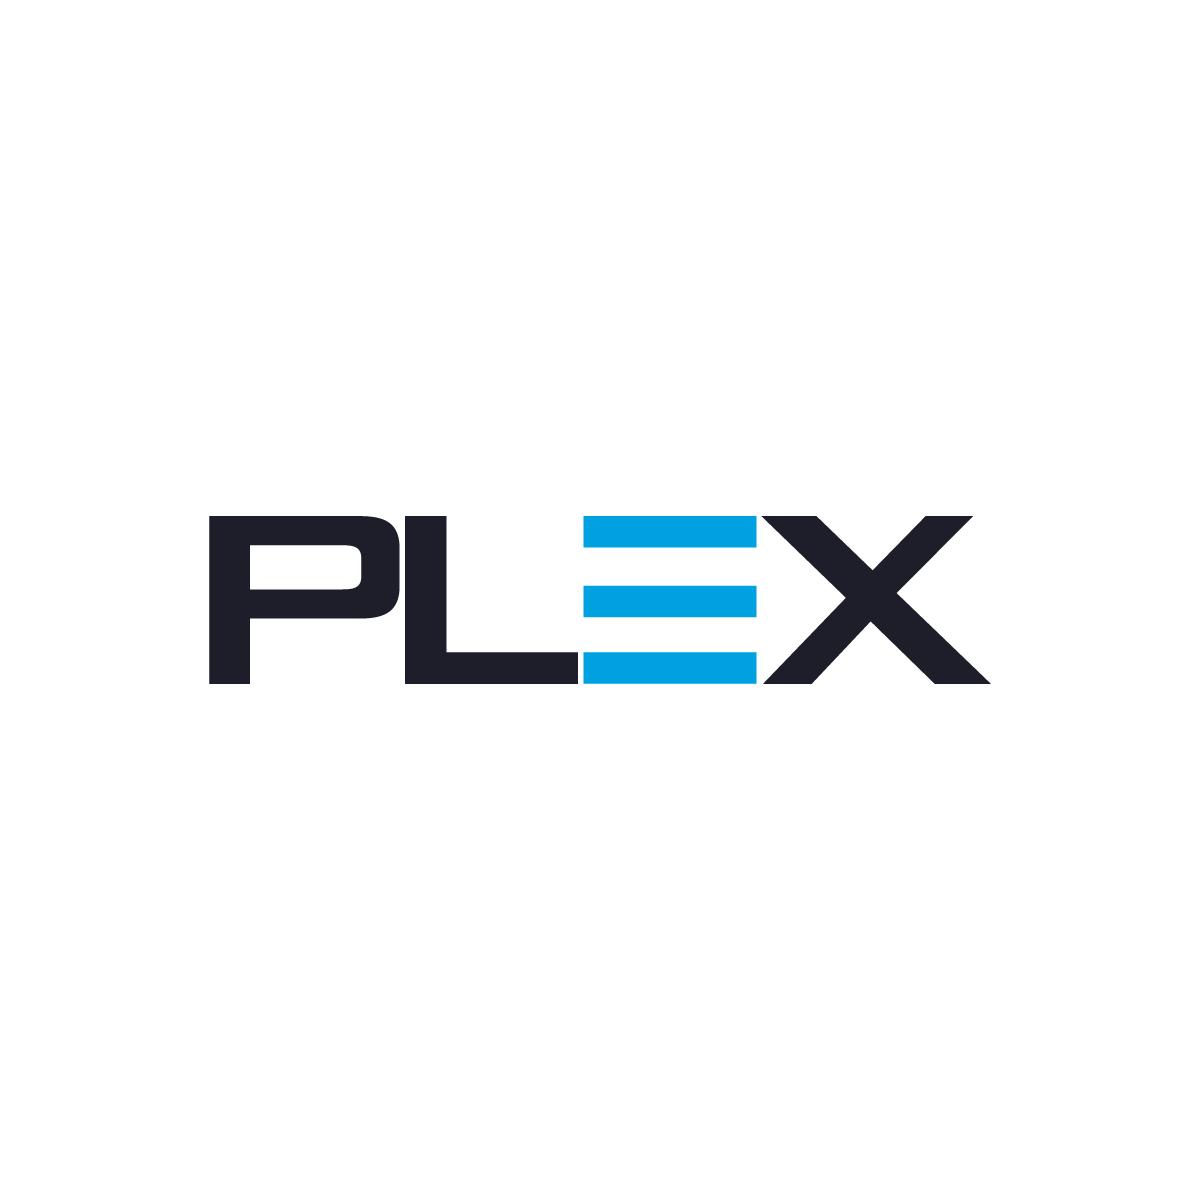 Plex Systems Stock